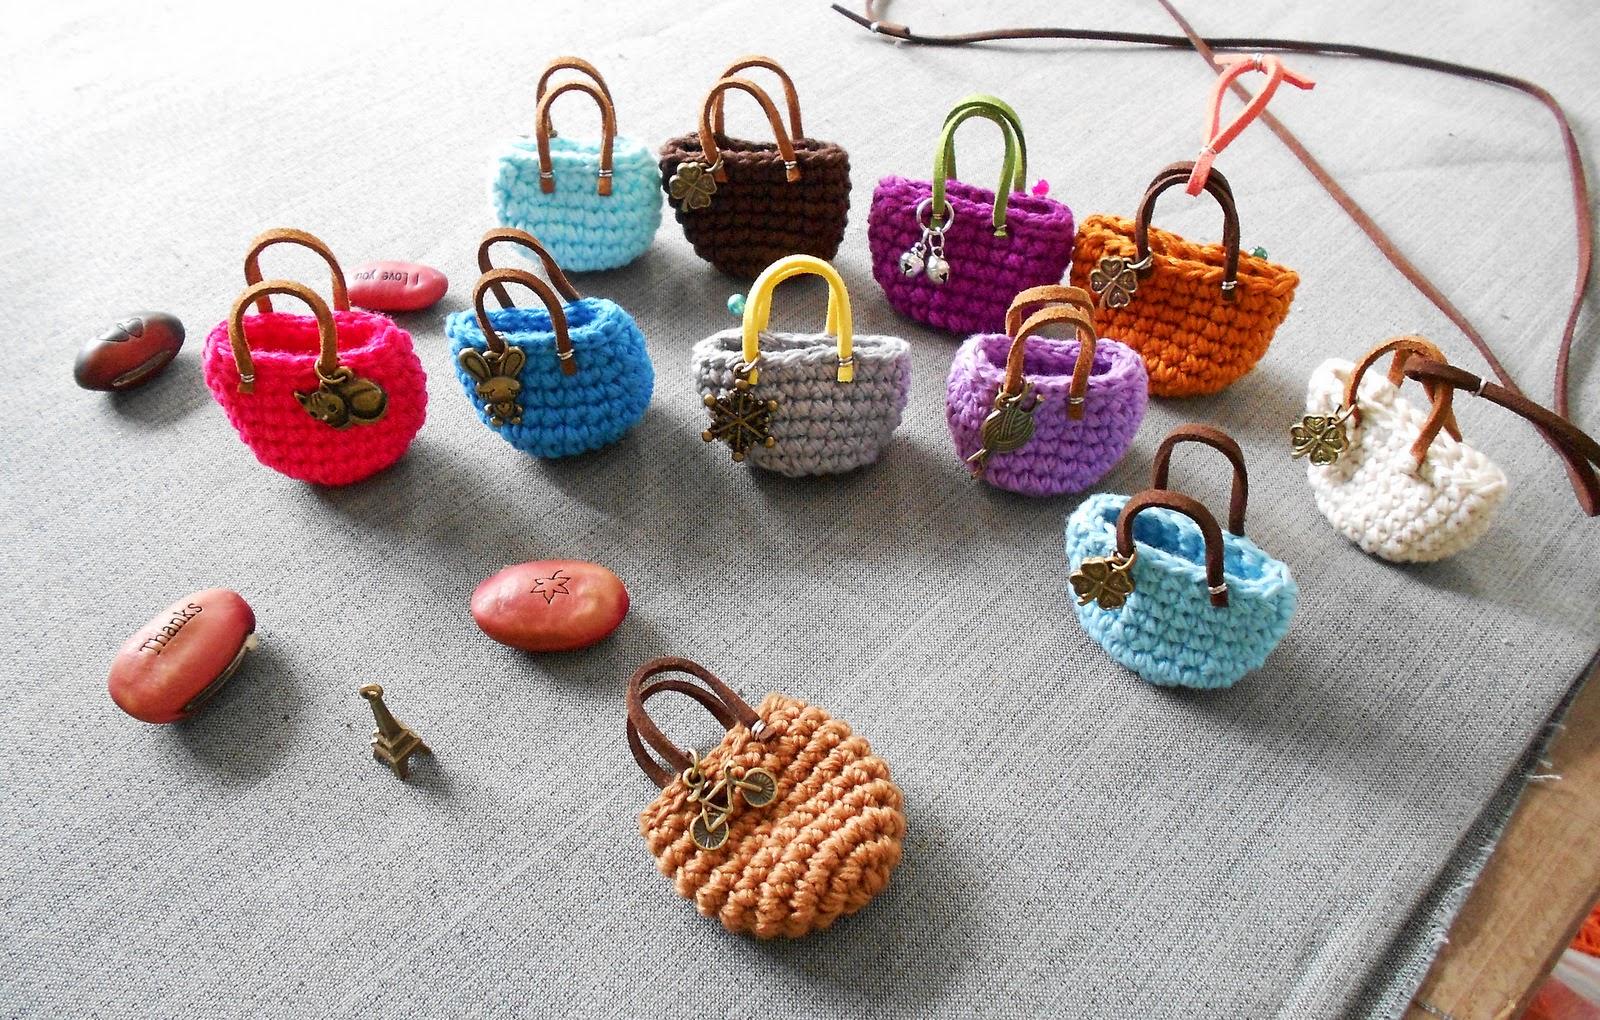 Firefly Crochet: Giỏ týhon key fob, lucky charm